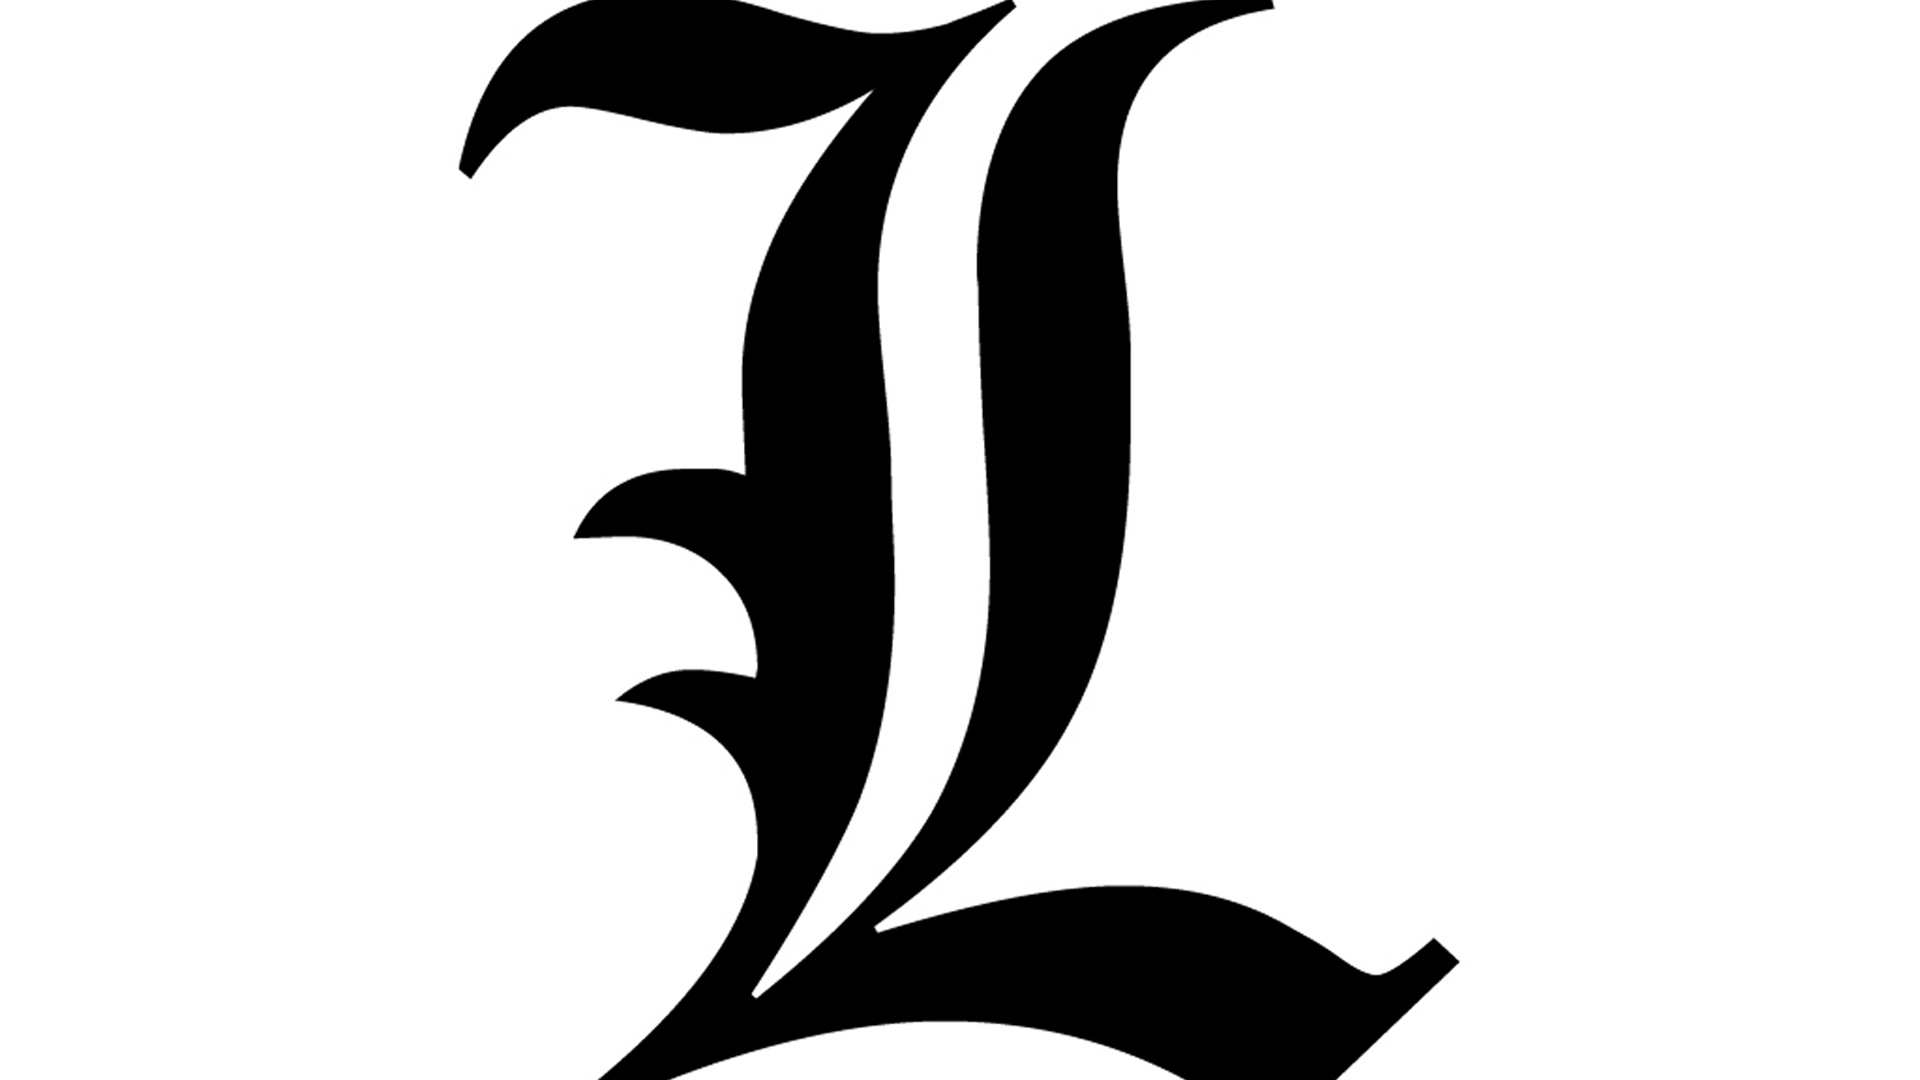 L death note Logos.